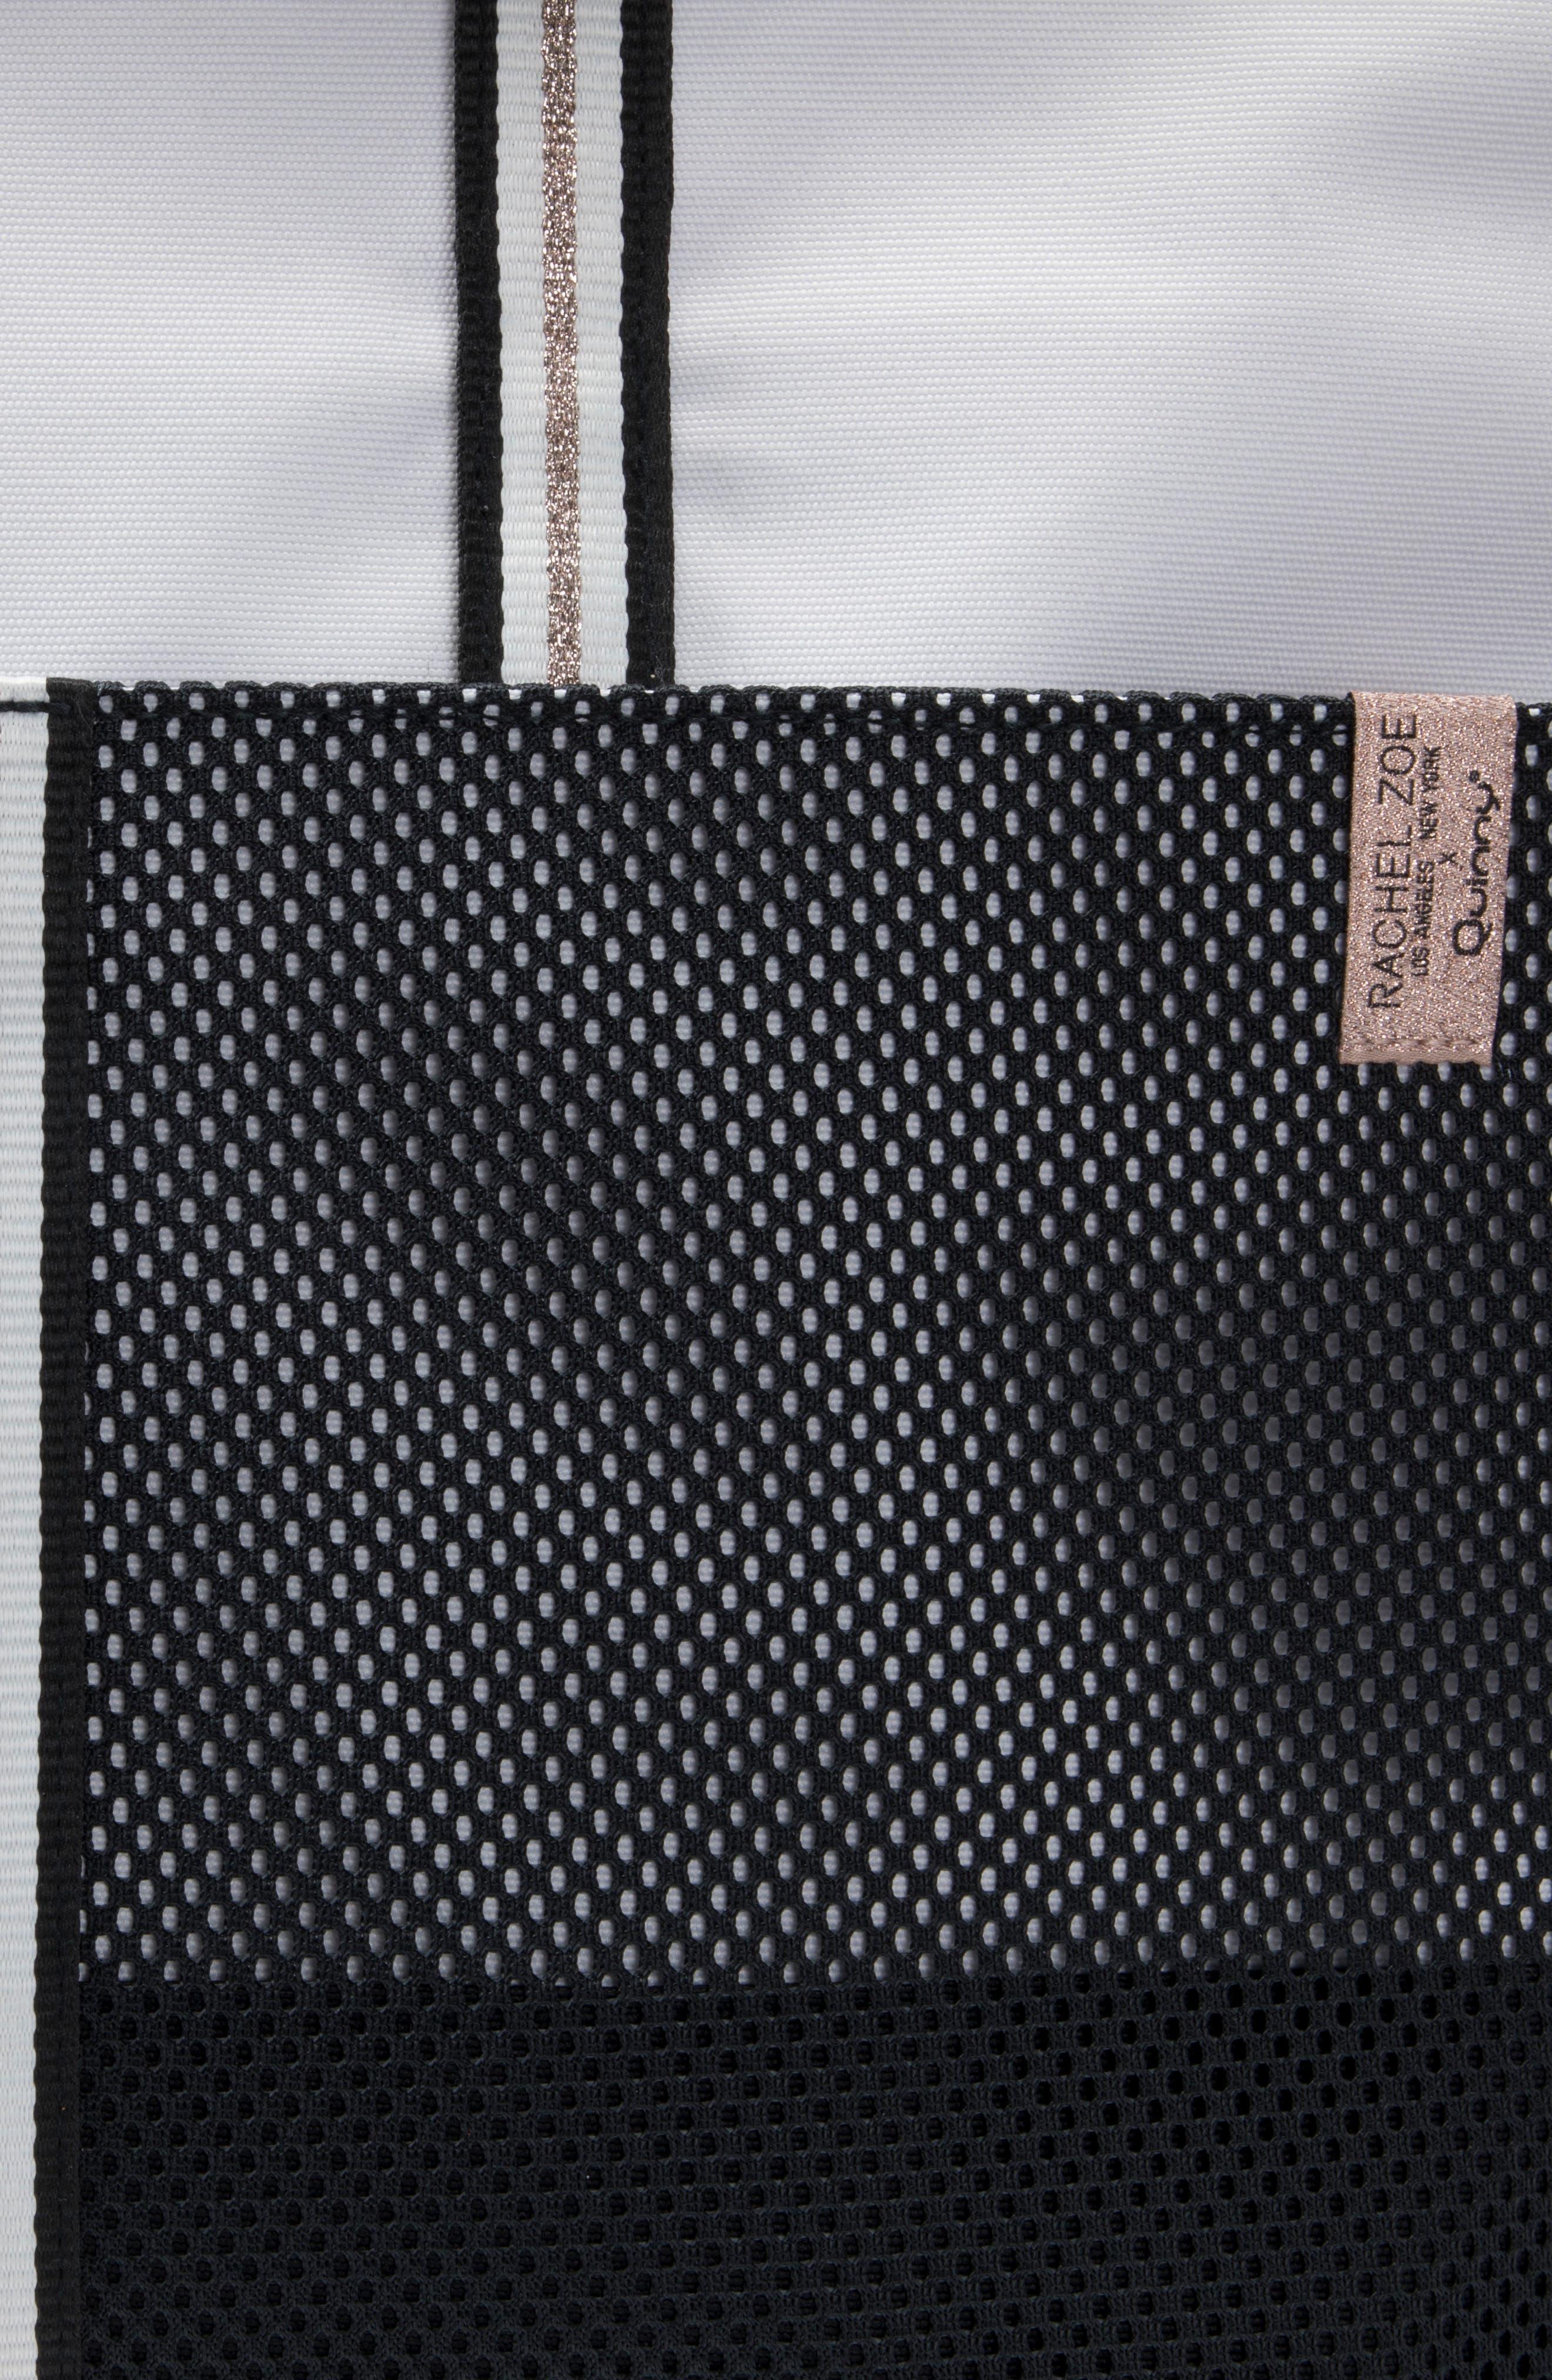 x Rachel Zoe Luxe Sport Diaper Bag,                             Alternate thumbnail 7, color,                             Rz Luxe Sport